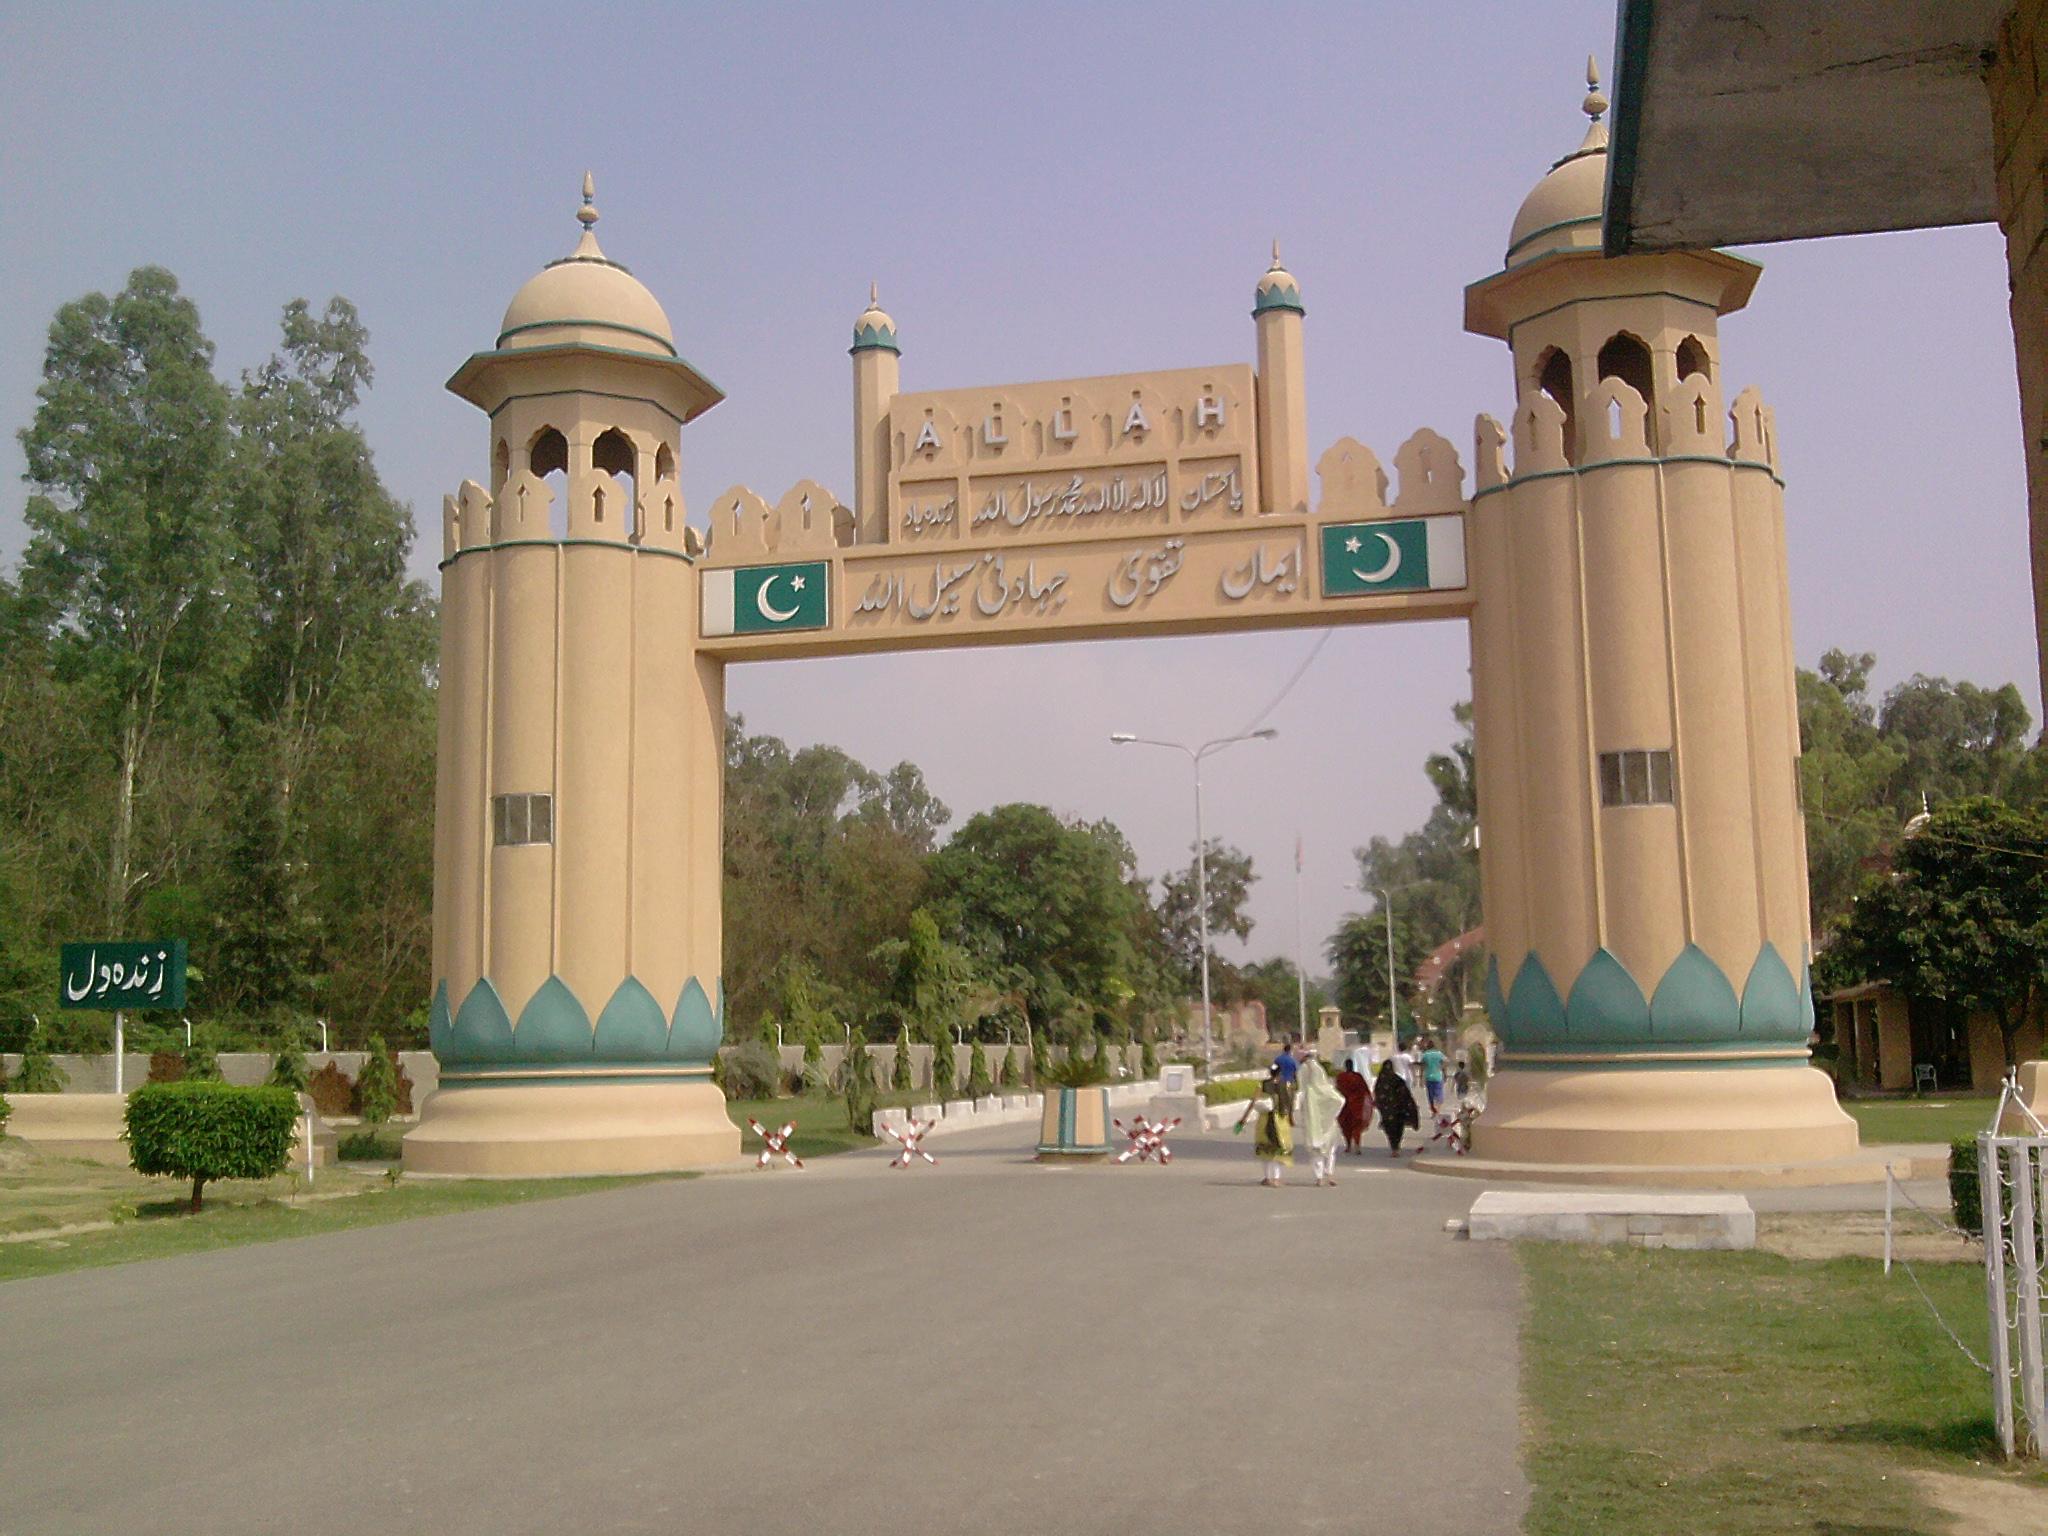 pakistan india border crossing ile ilgili görsel sonucu